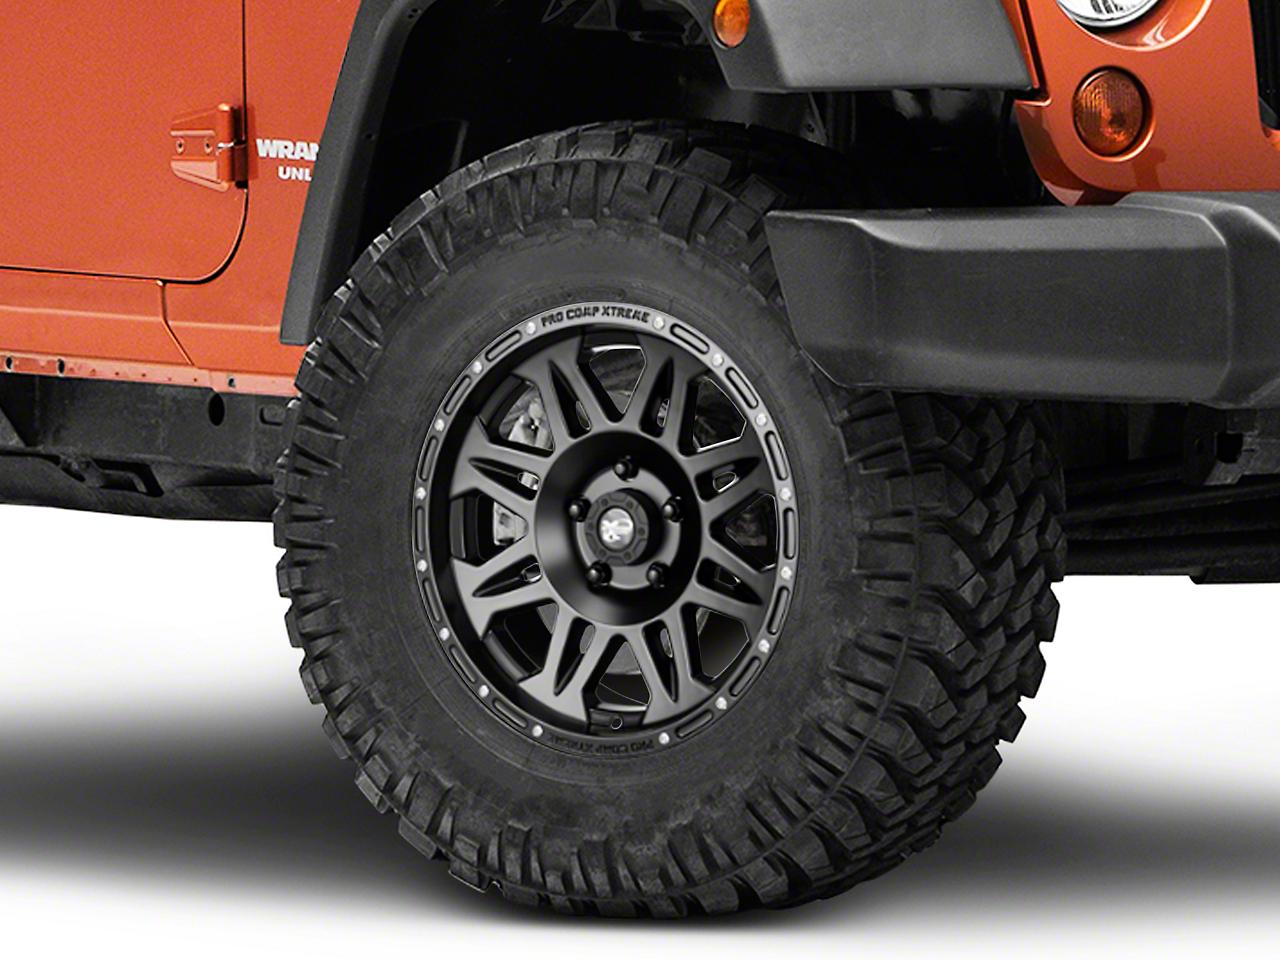 Pro Comp Alloy Series 7005 Flat Black Wheel - 17x8 (07-18 Jeep Wrangler JK; 2018 Jeep Wrangler JL)